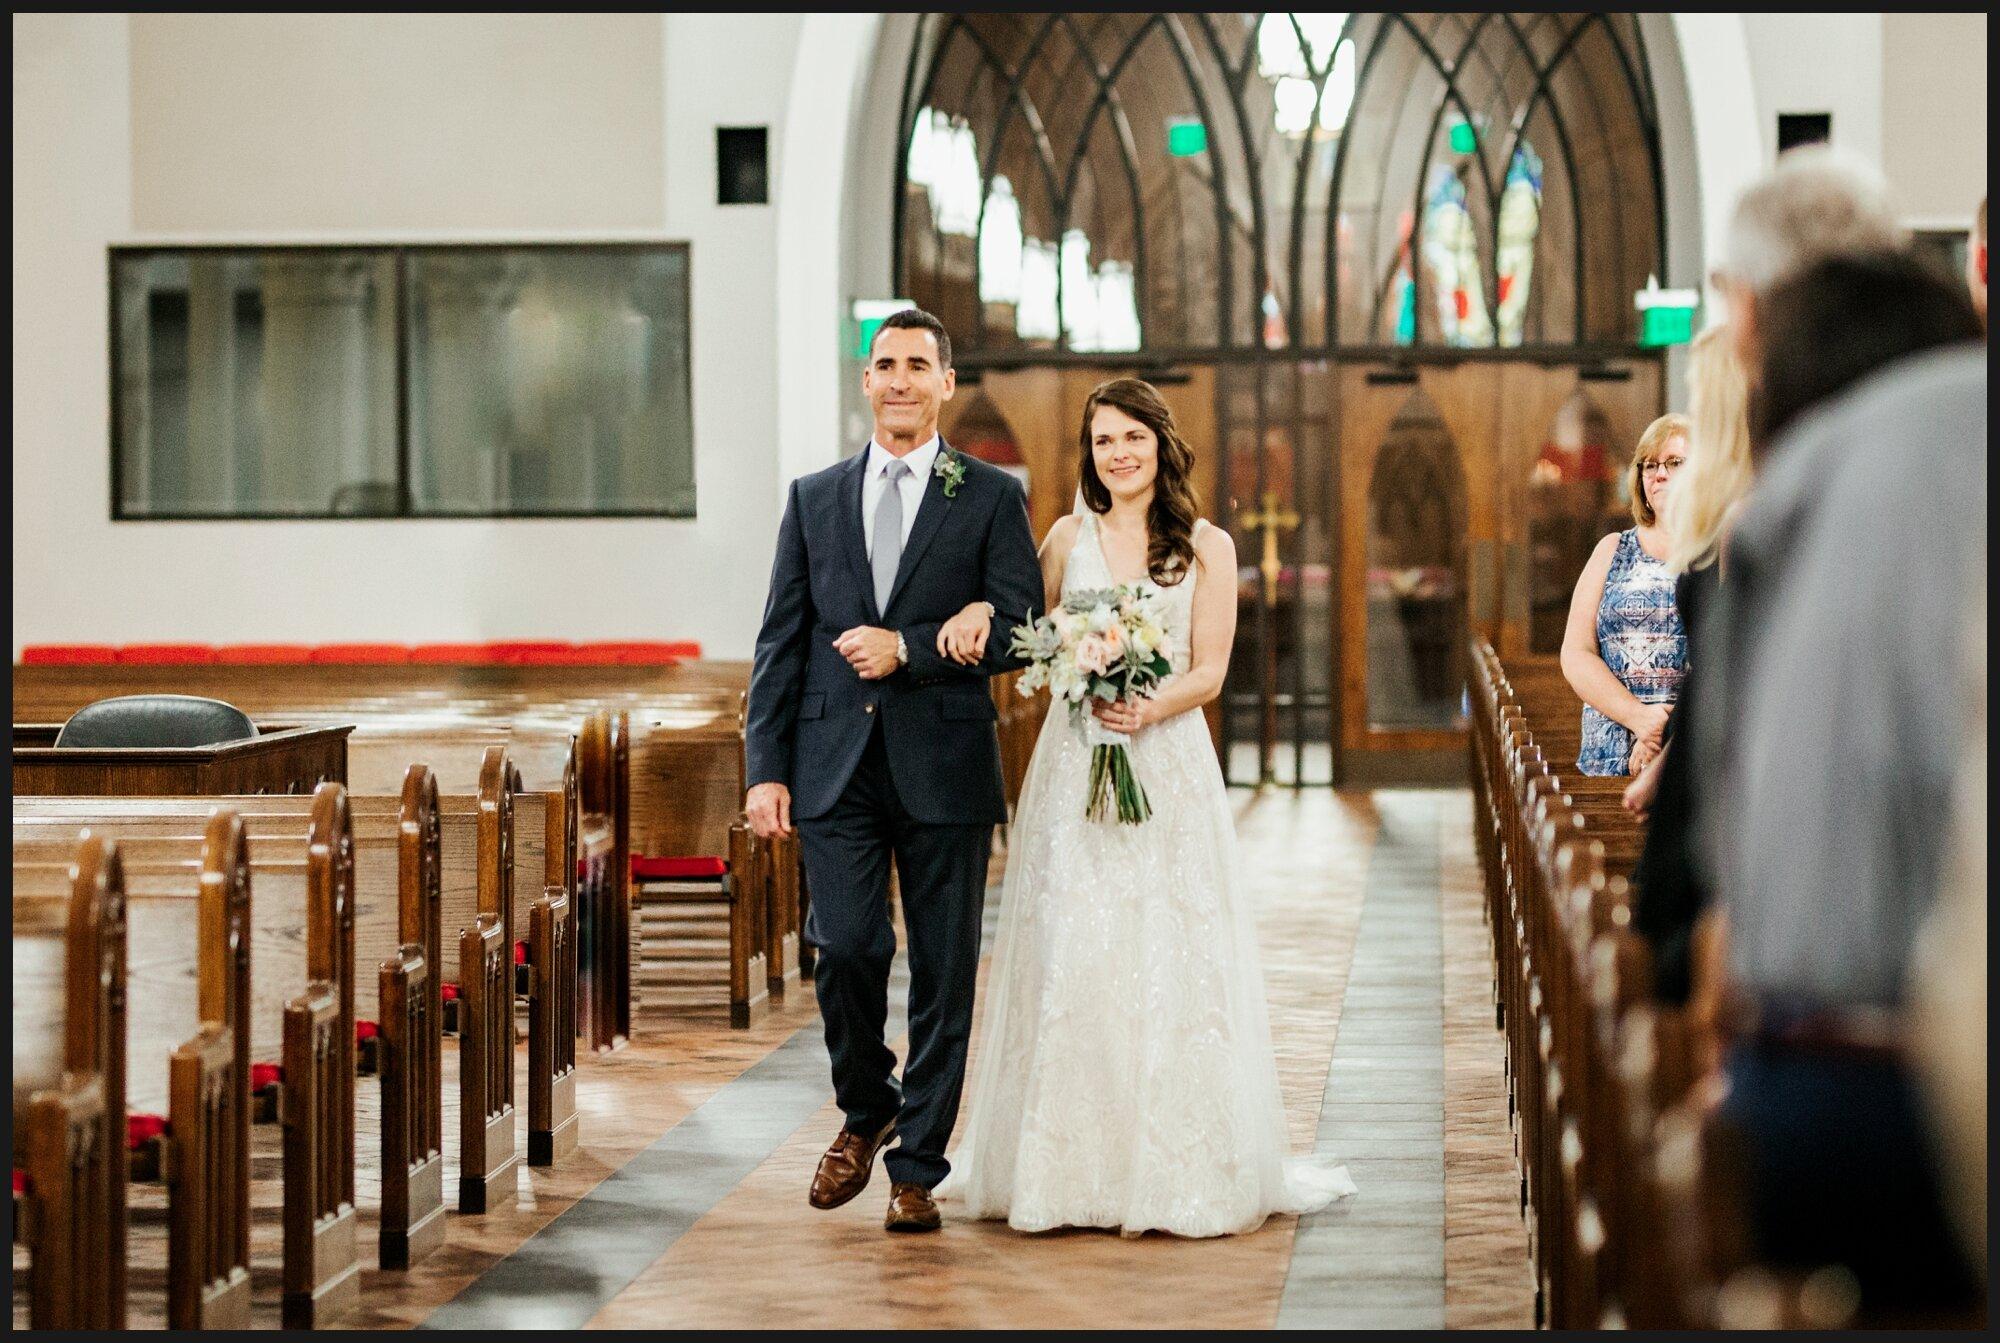 Orlando-Wedding-Photographer-destination-wedding-photographer-florida-wedding-photographer-hawaii-wedding-photographer_0676.jpg